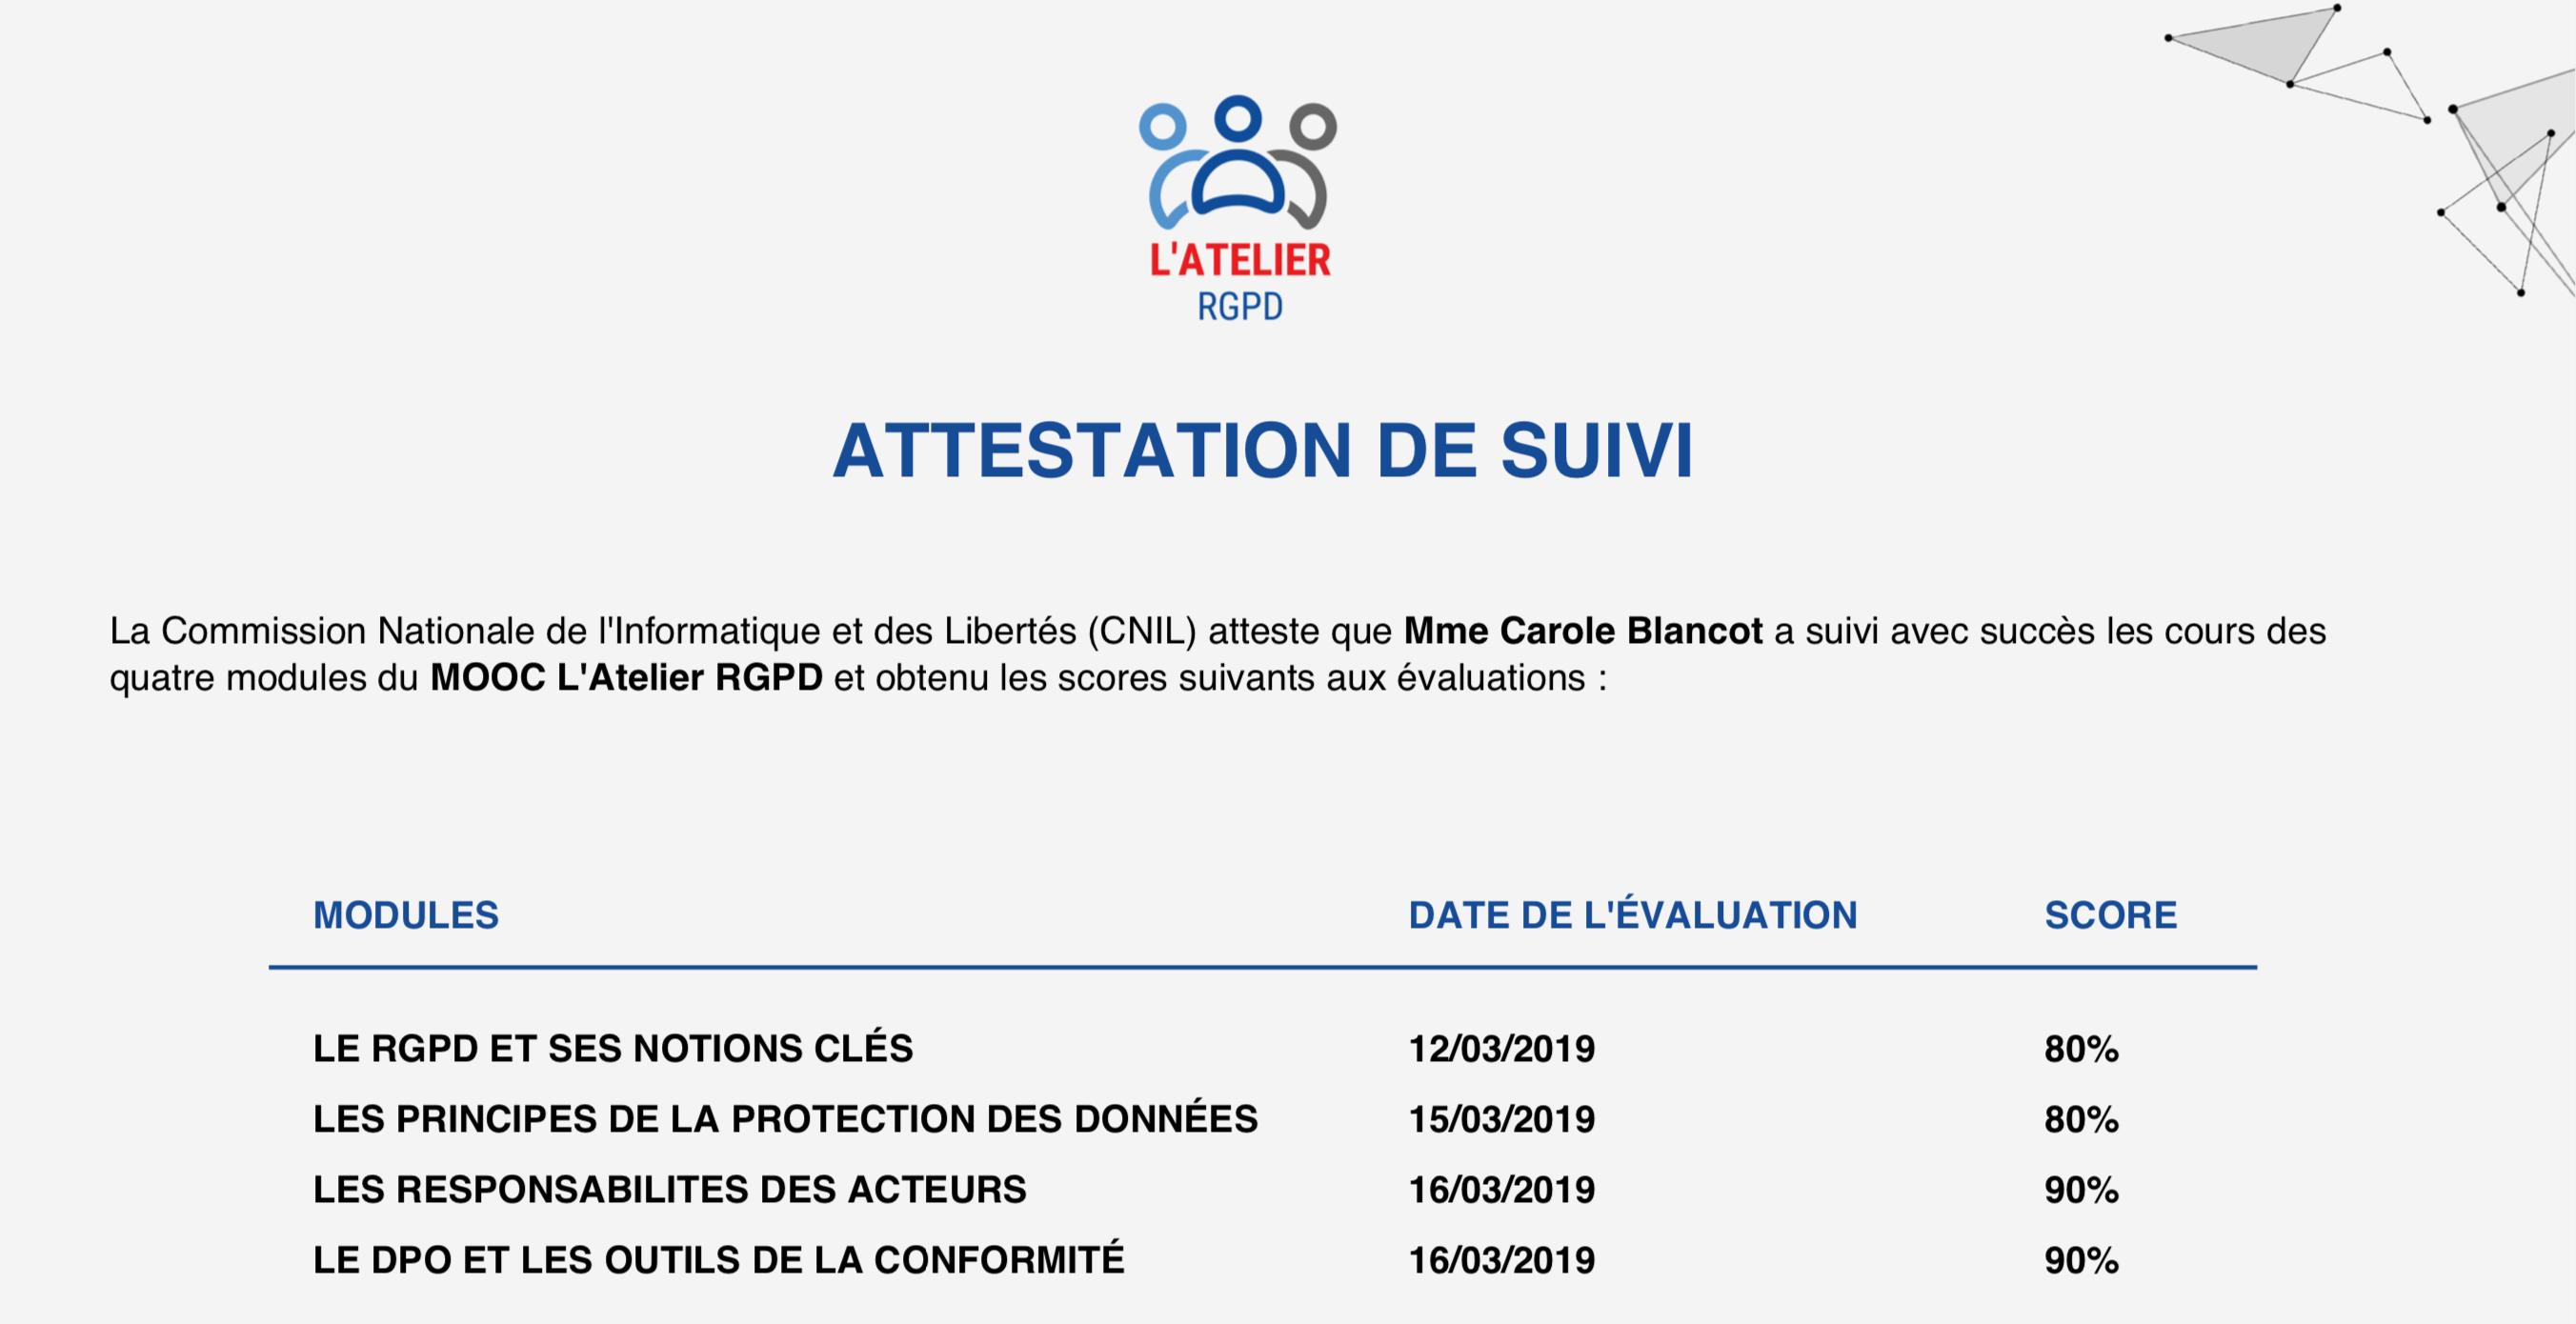 Attestion suivi Mooc CNIL